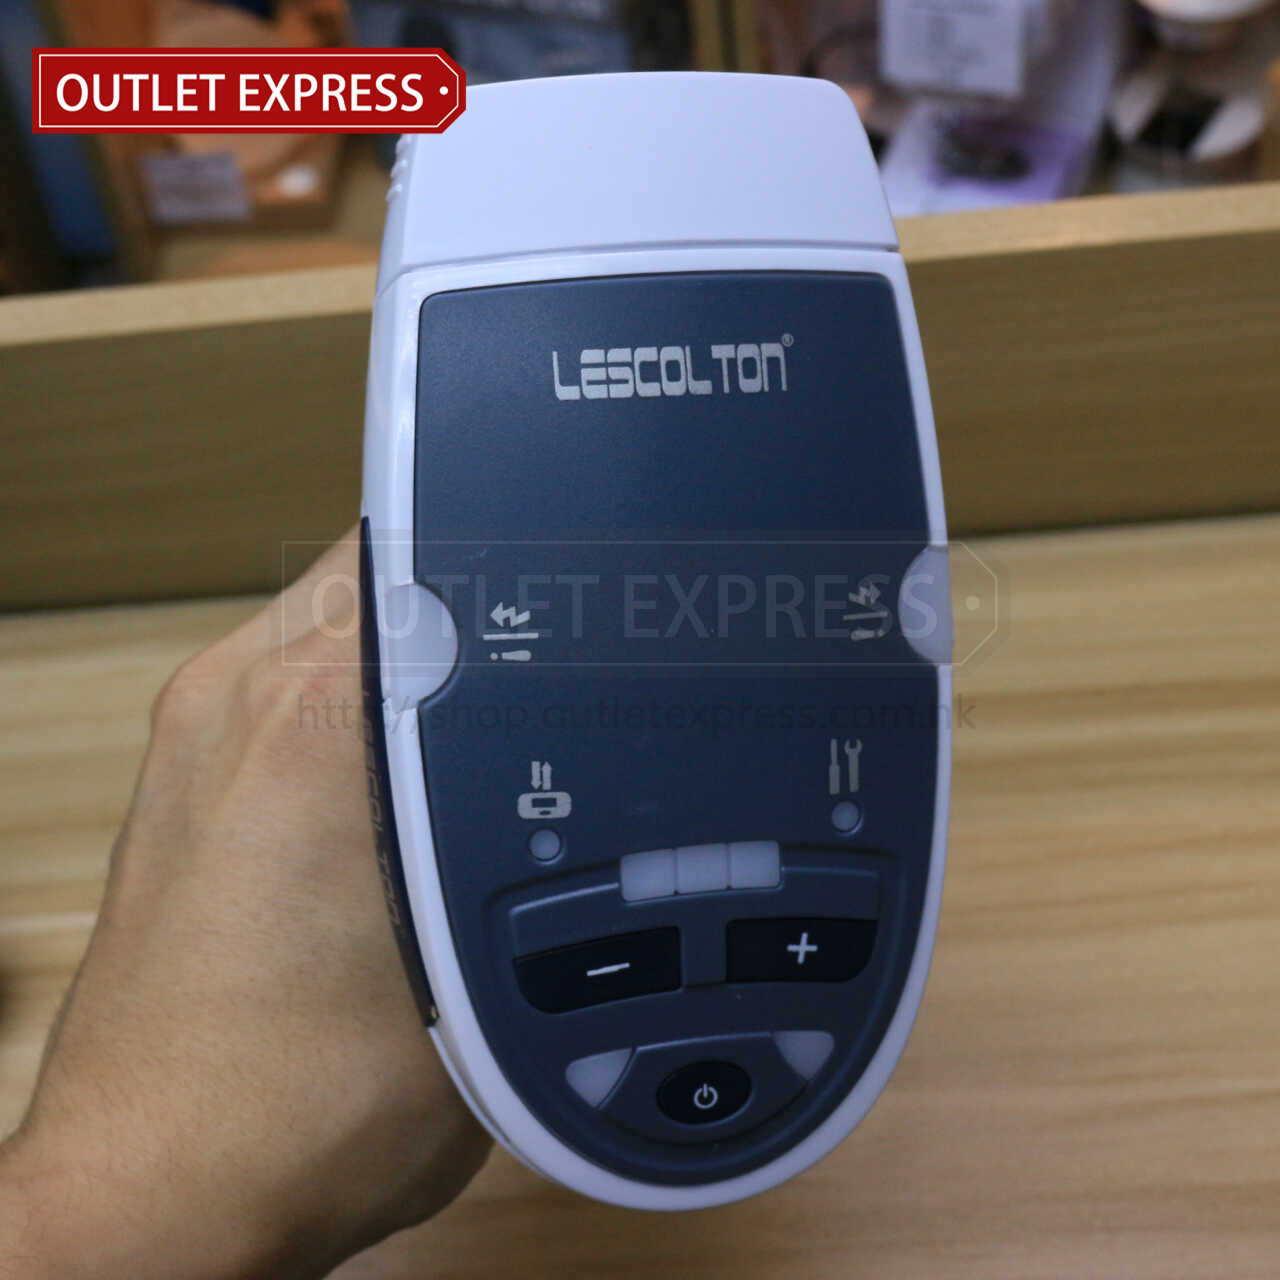 Lescolton T-006 家用激光脫毛儀 | 脫毛機  多種設定- Outlet Express HK生活百貨城實拍相片